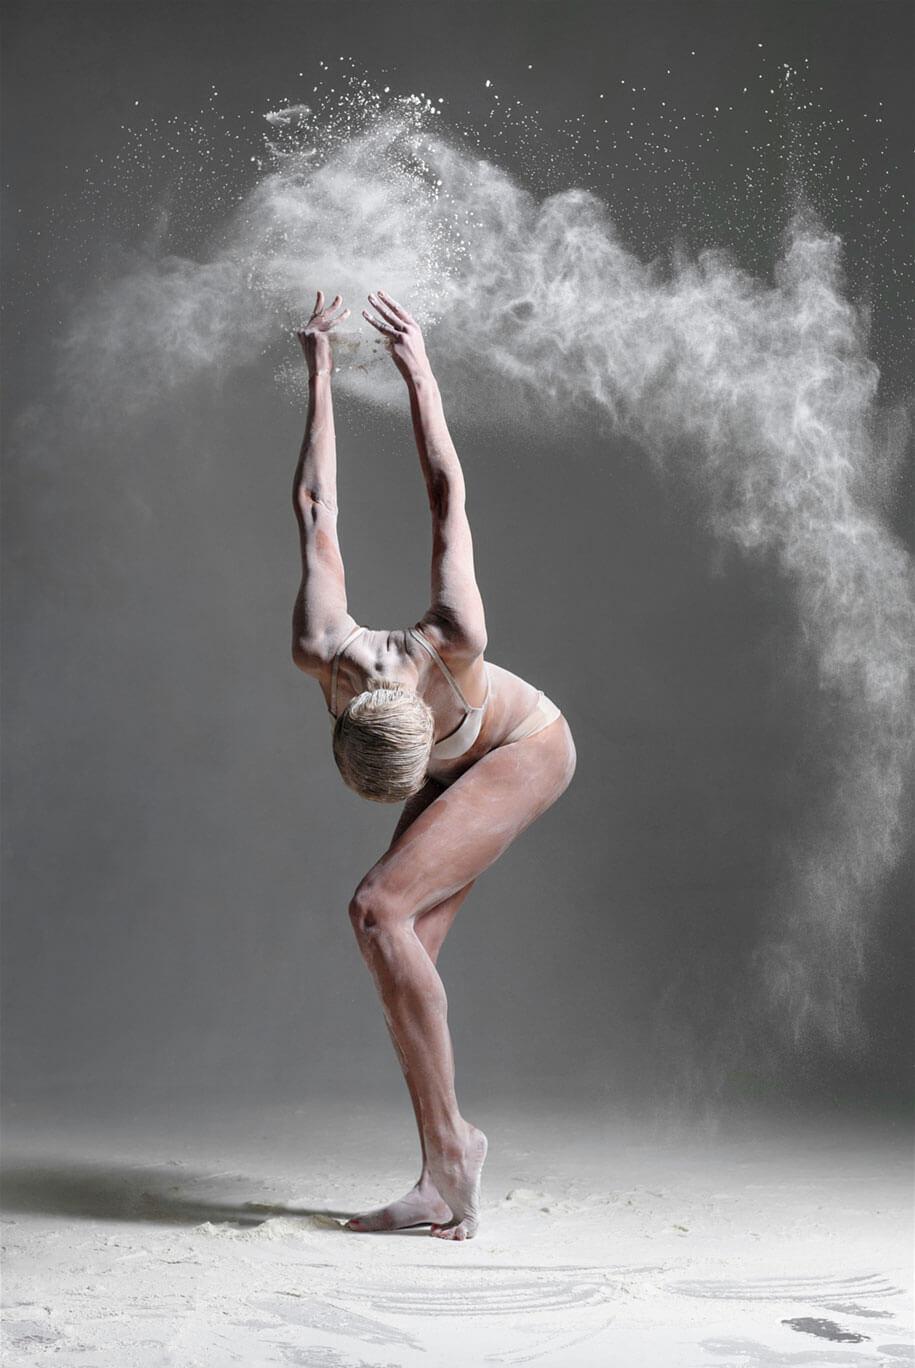 flour-ballet-portraits-alexander-yako-fy-8